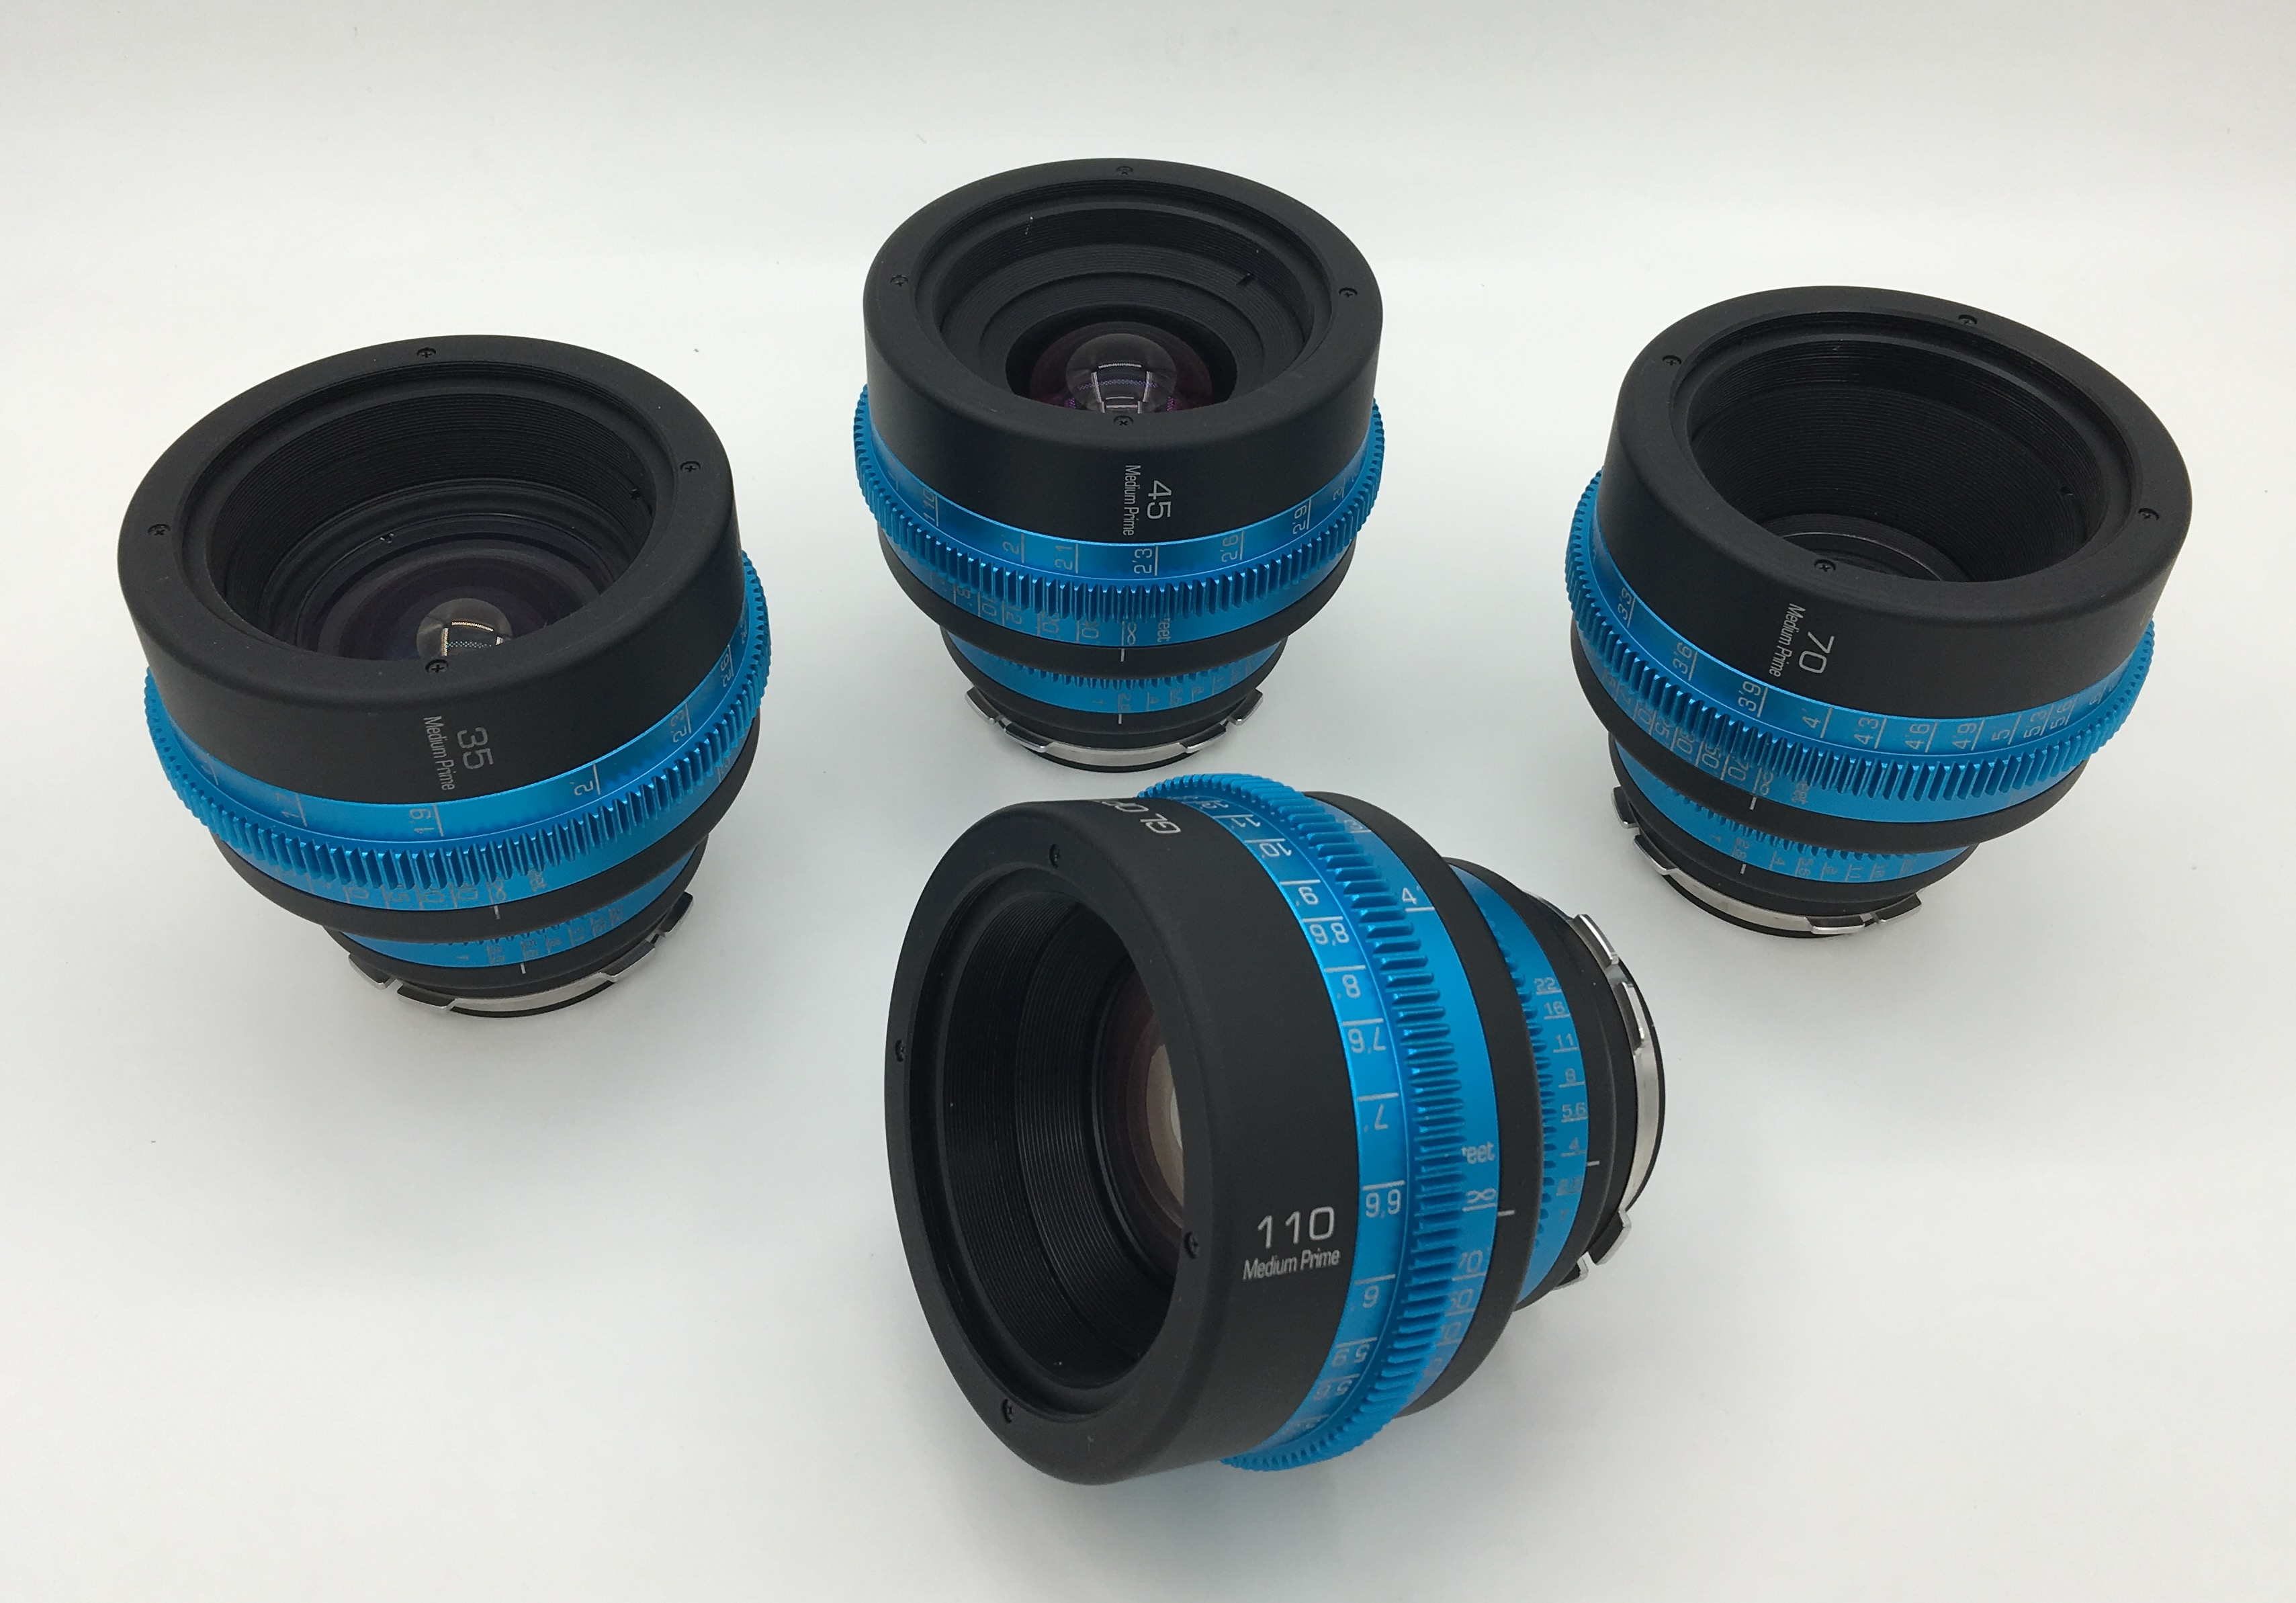 G.L. Optics announce new range of medium format PL cine lens ...